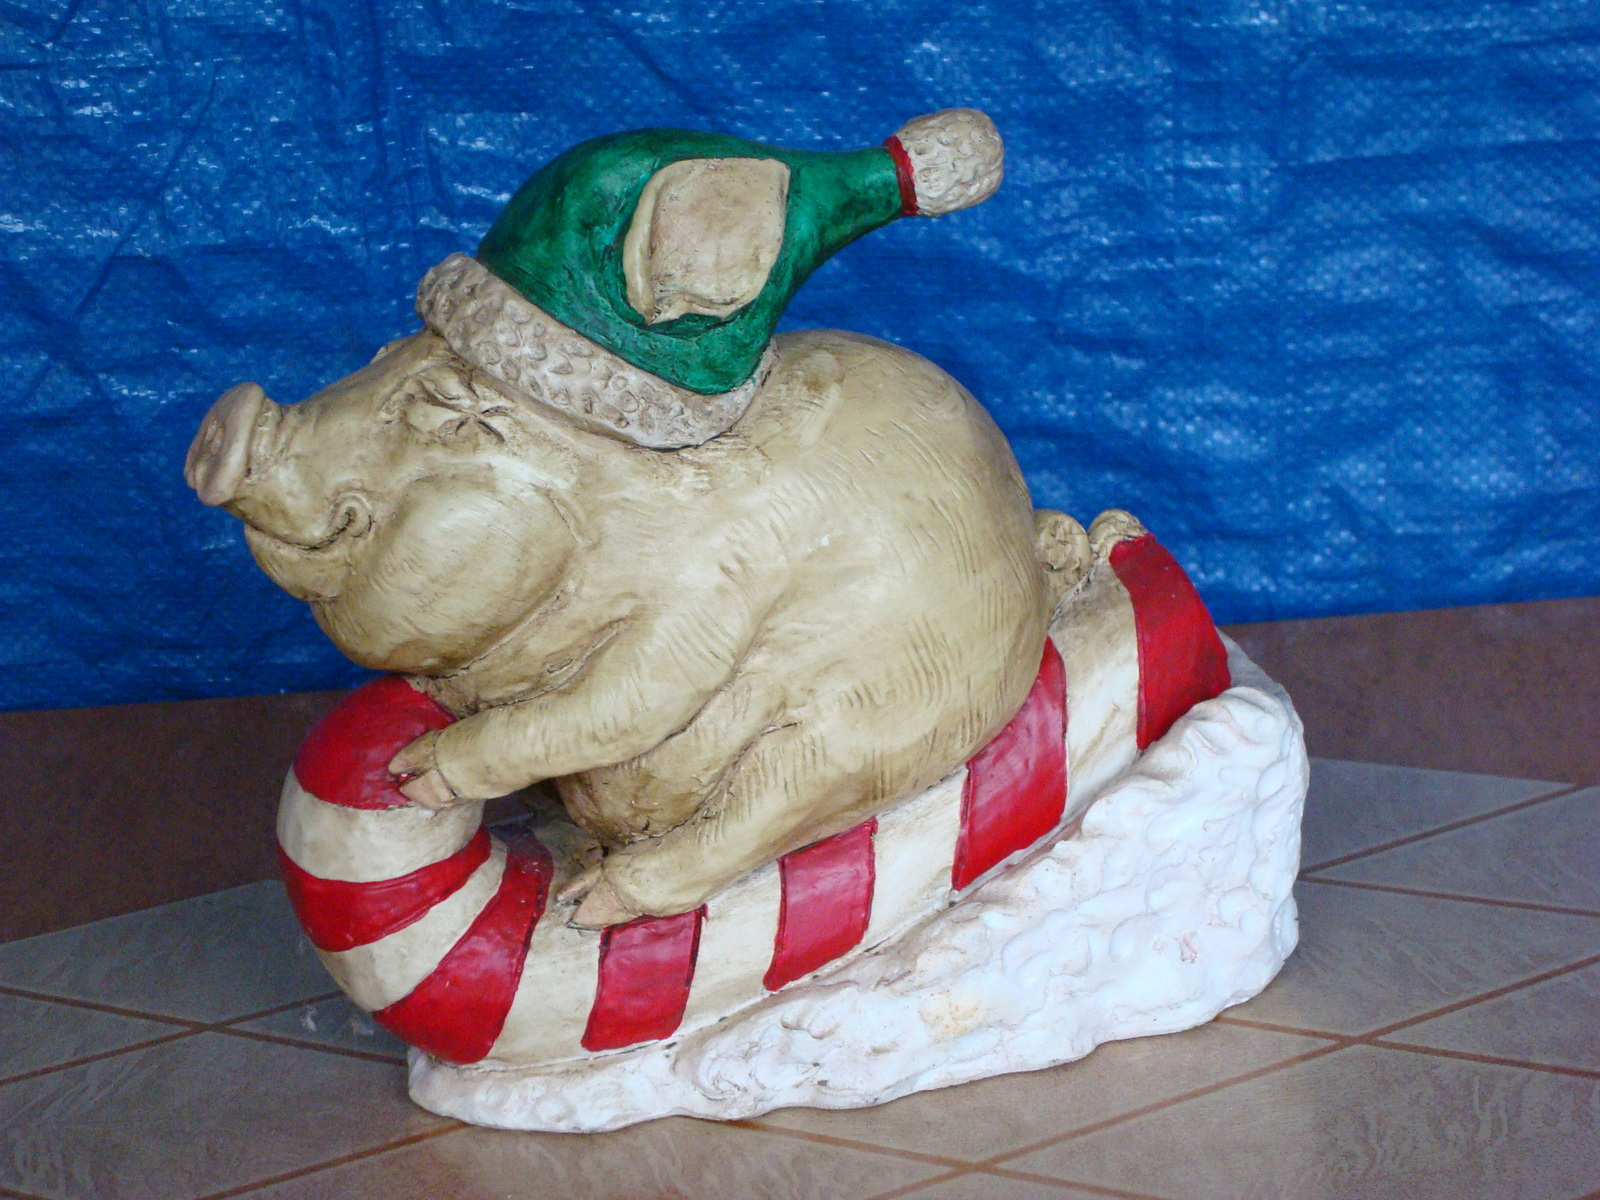 #0830 Piggy Sleigh Ride Statue image 2